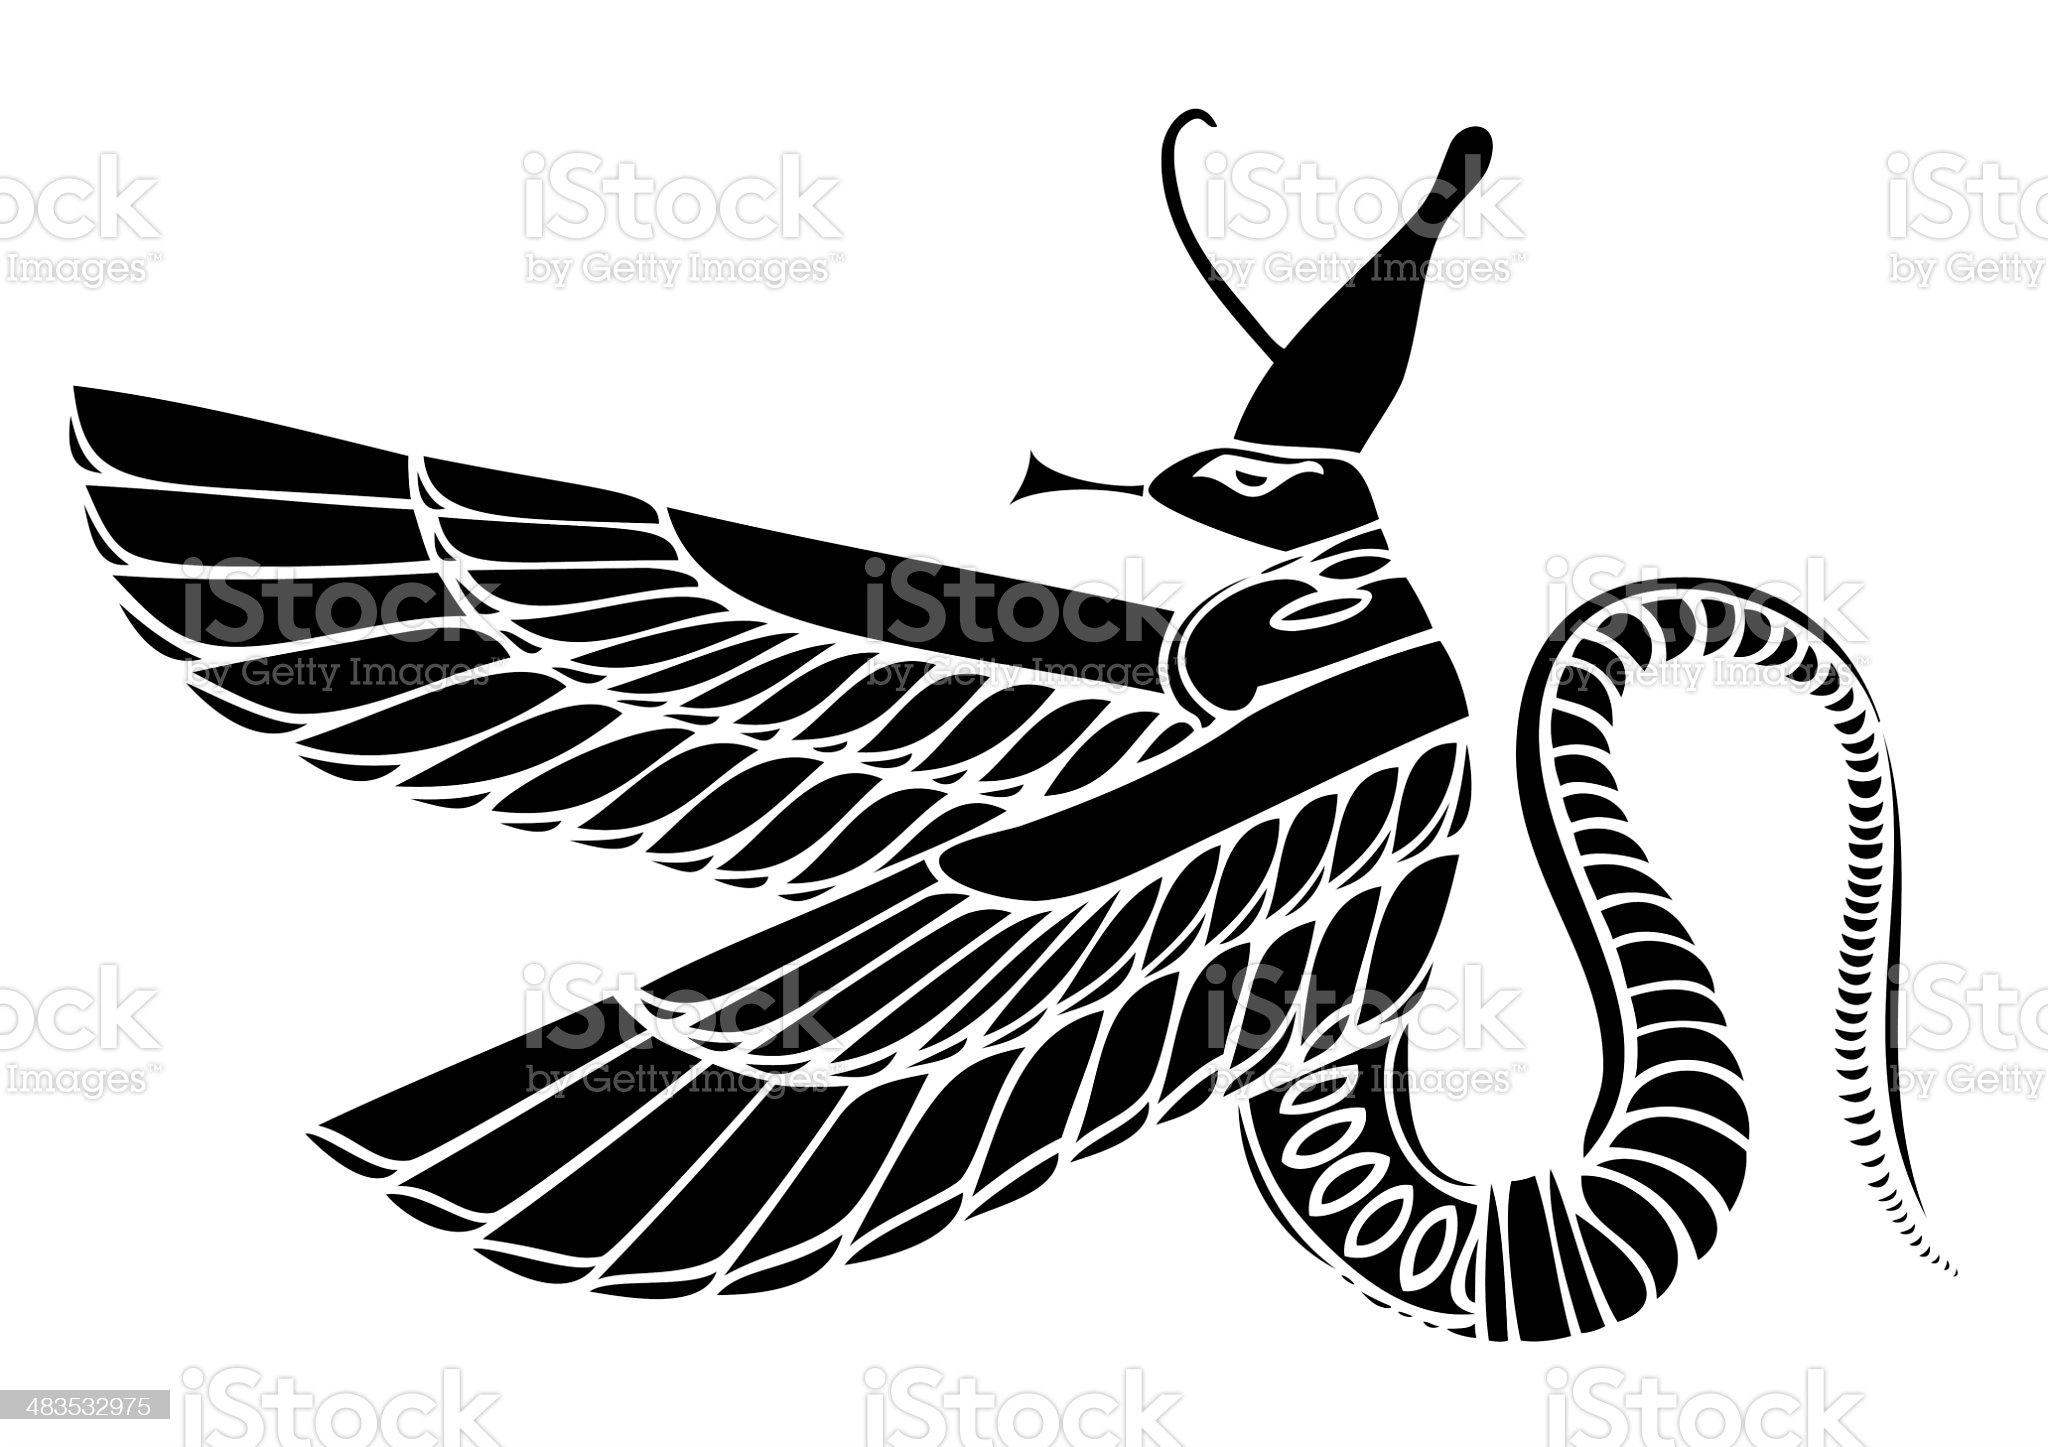 Egyptian demon royalty-free stock vector art